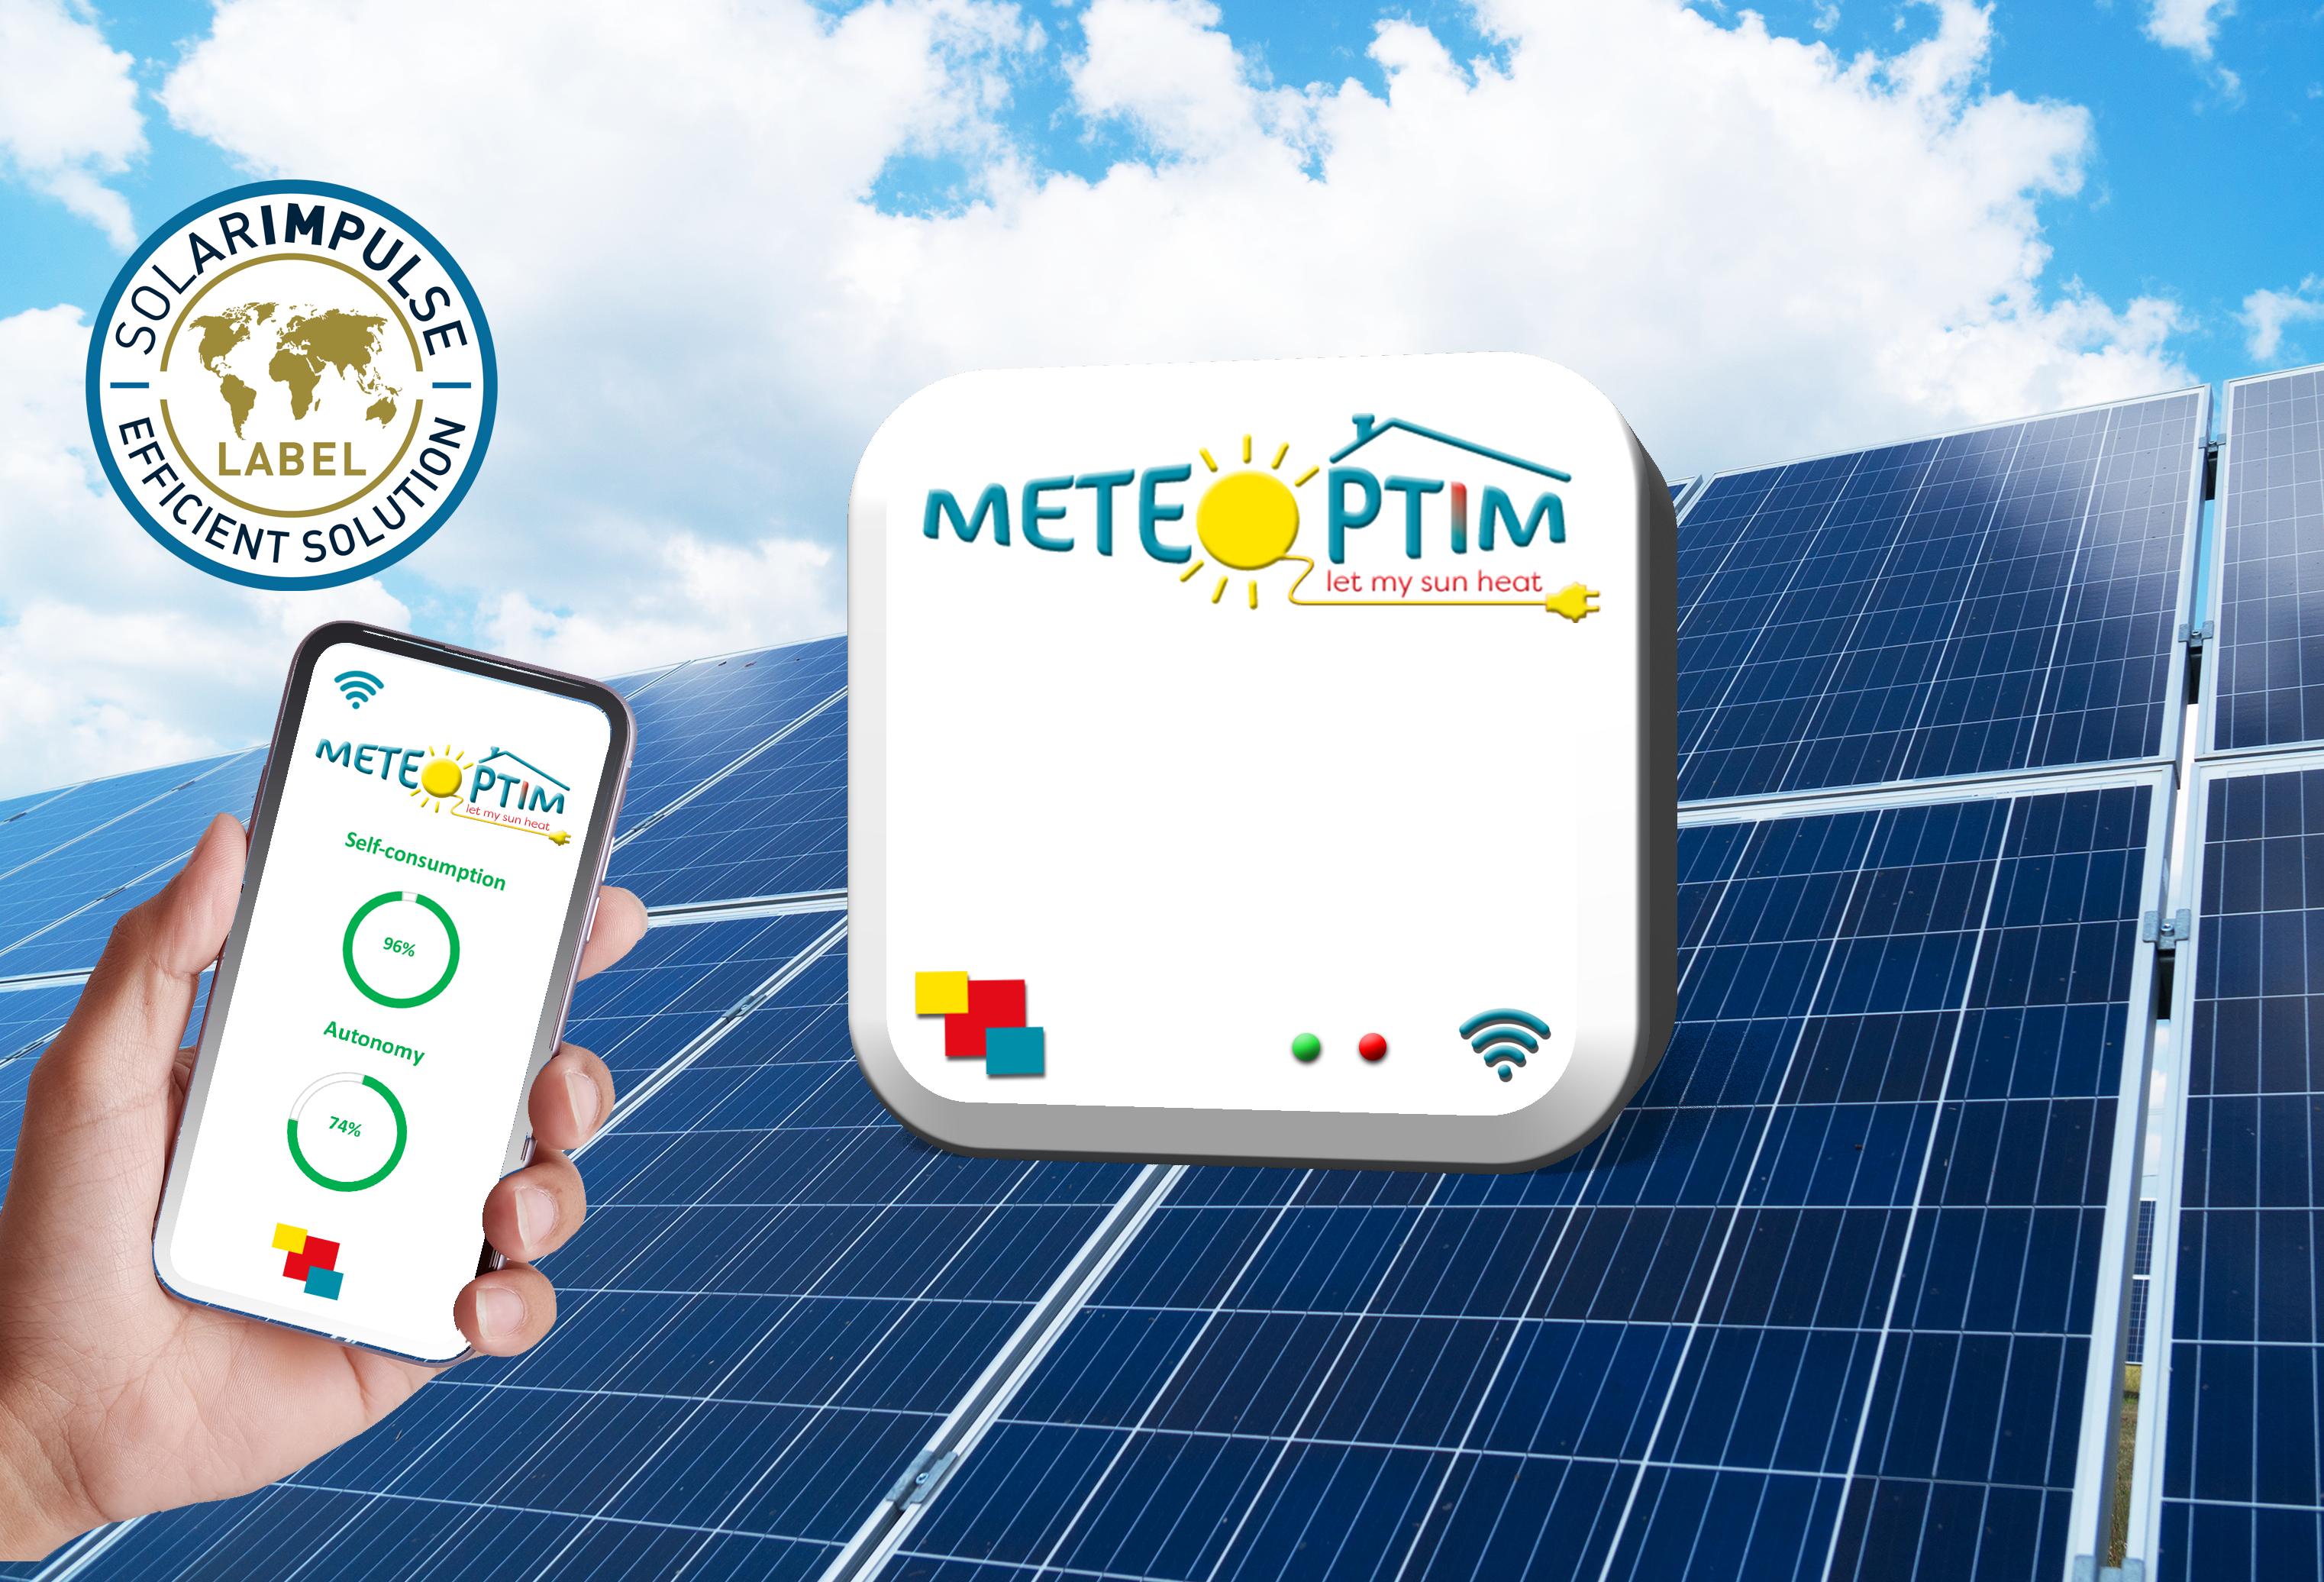 box meteoptim logo solar impulse